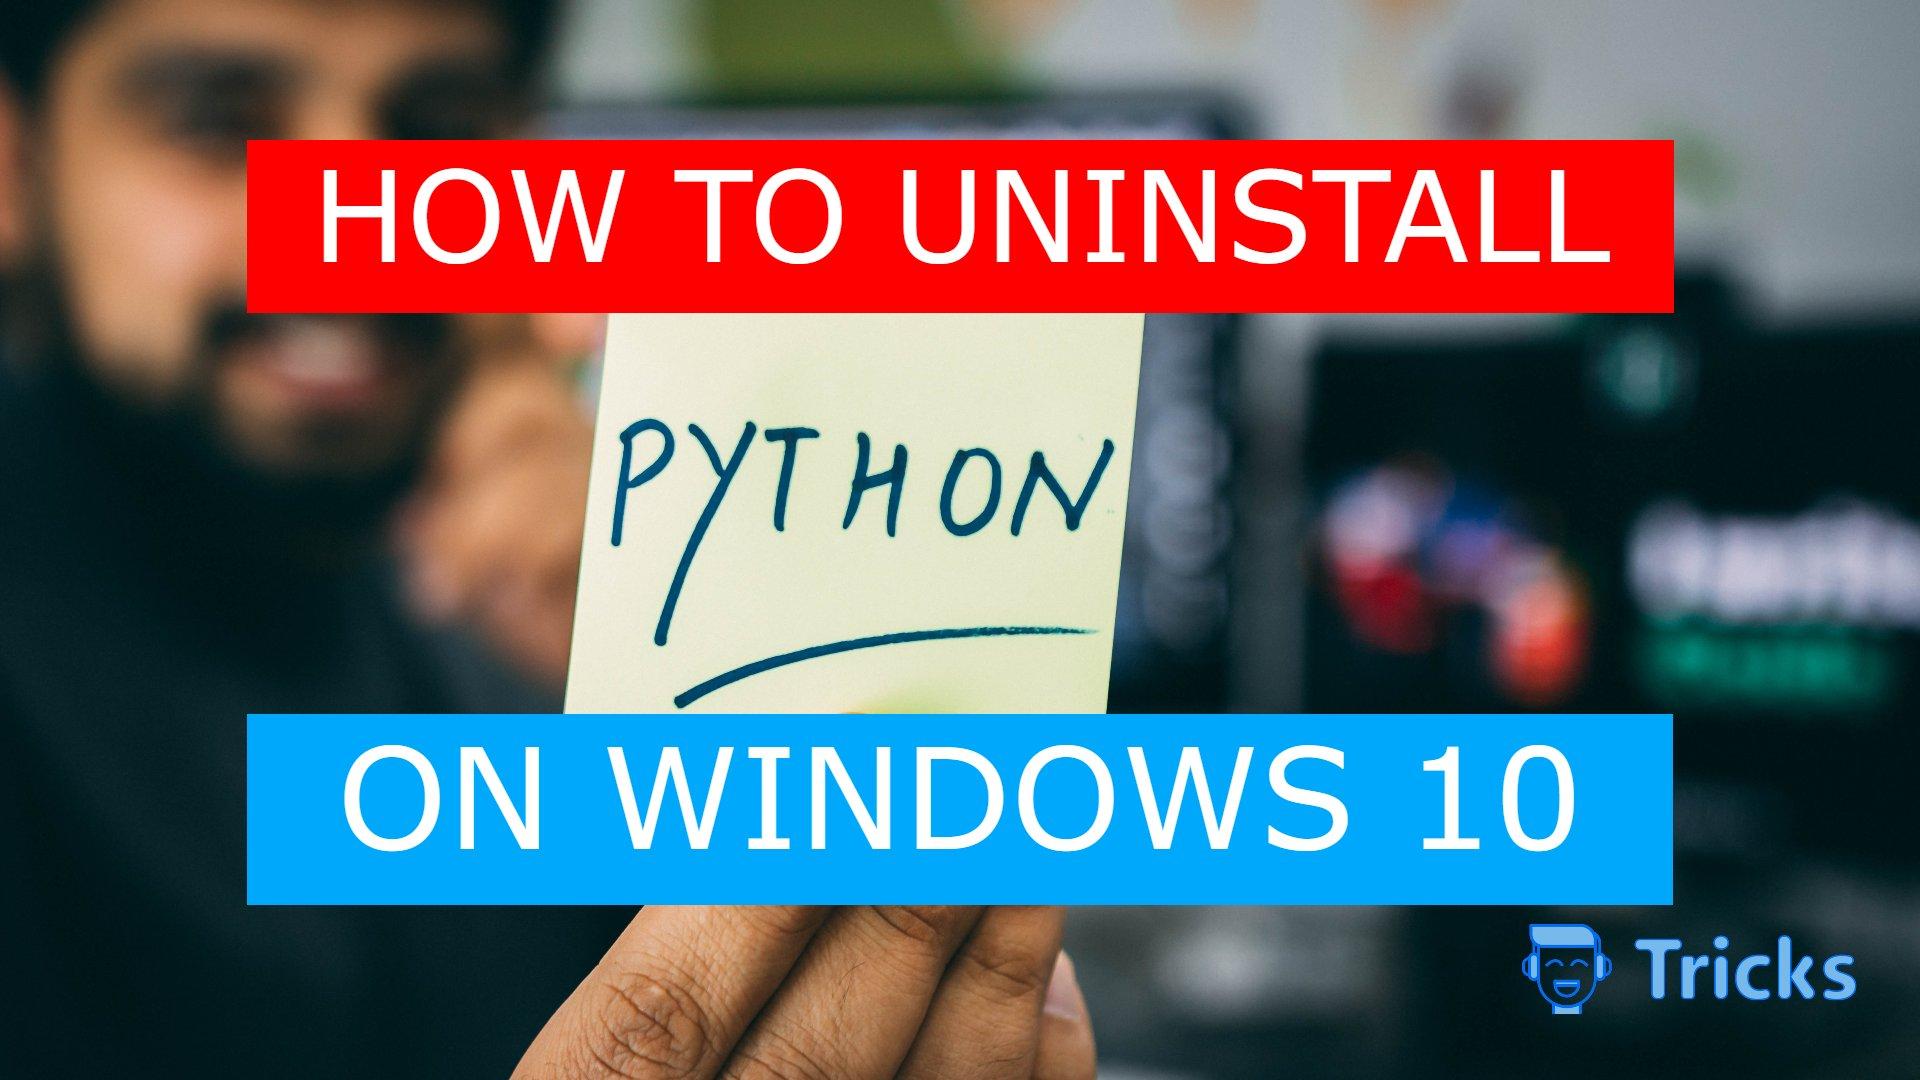 How to uninstall python on windows (2)